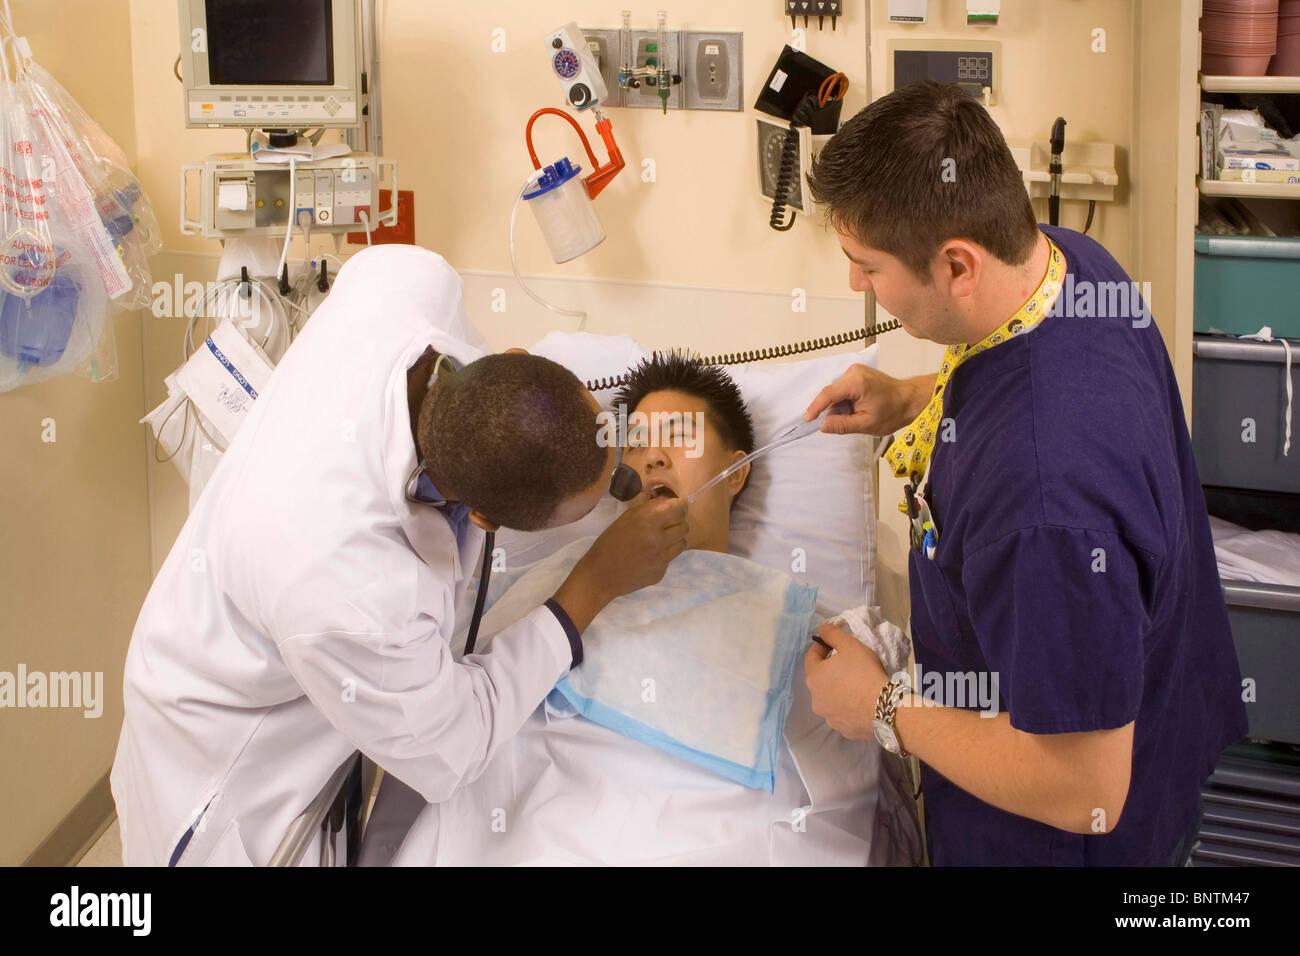 Emergency room physician (left) examines teen drug overdose